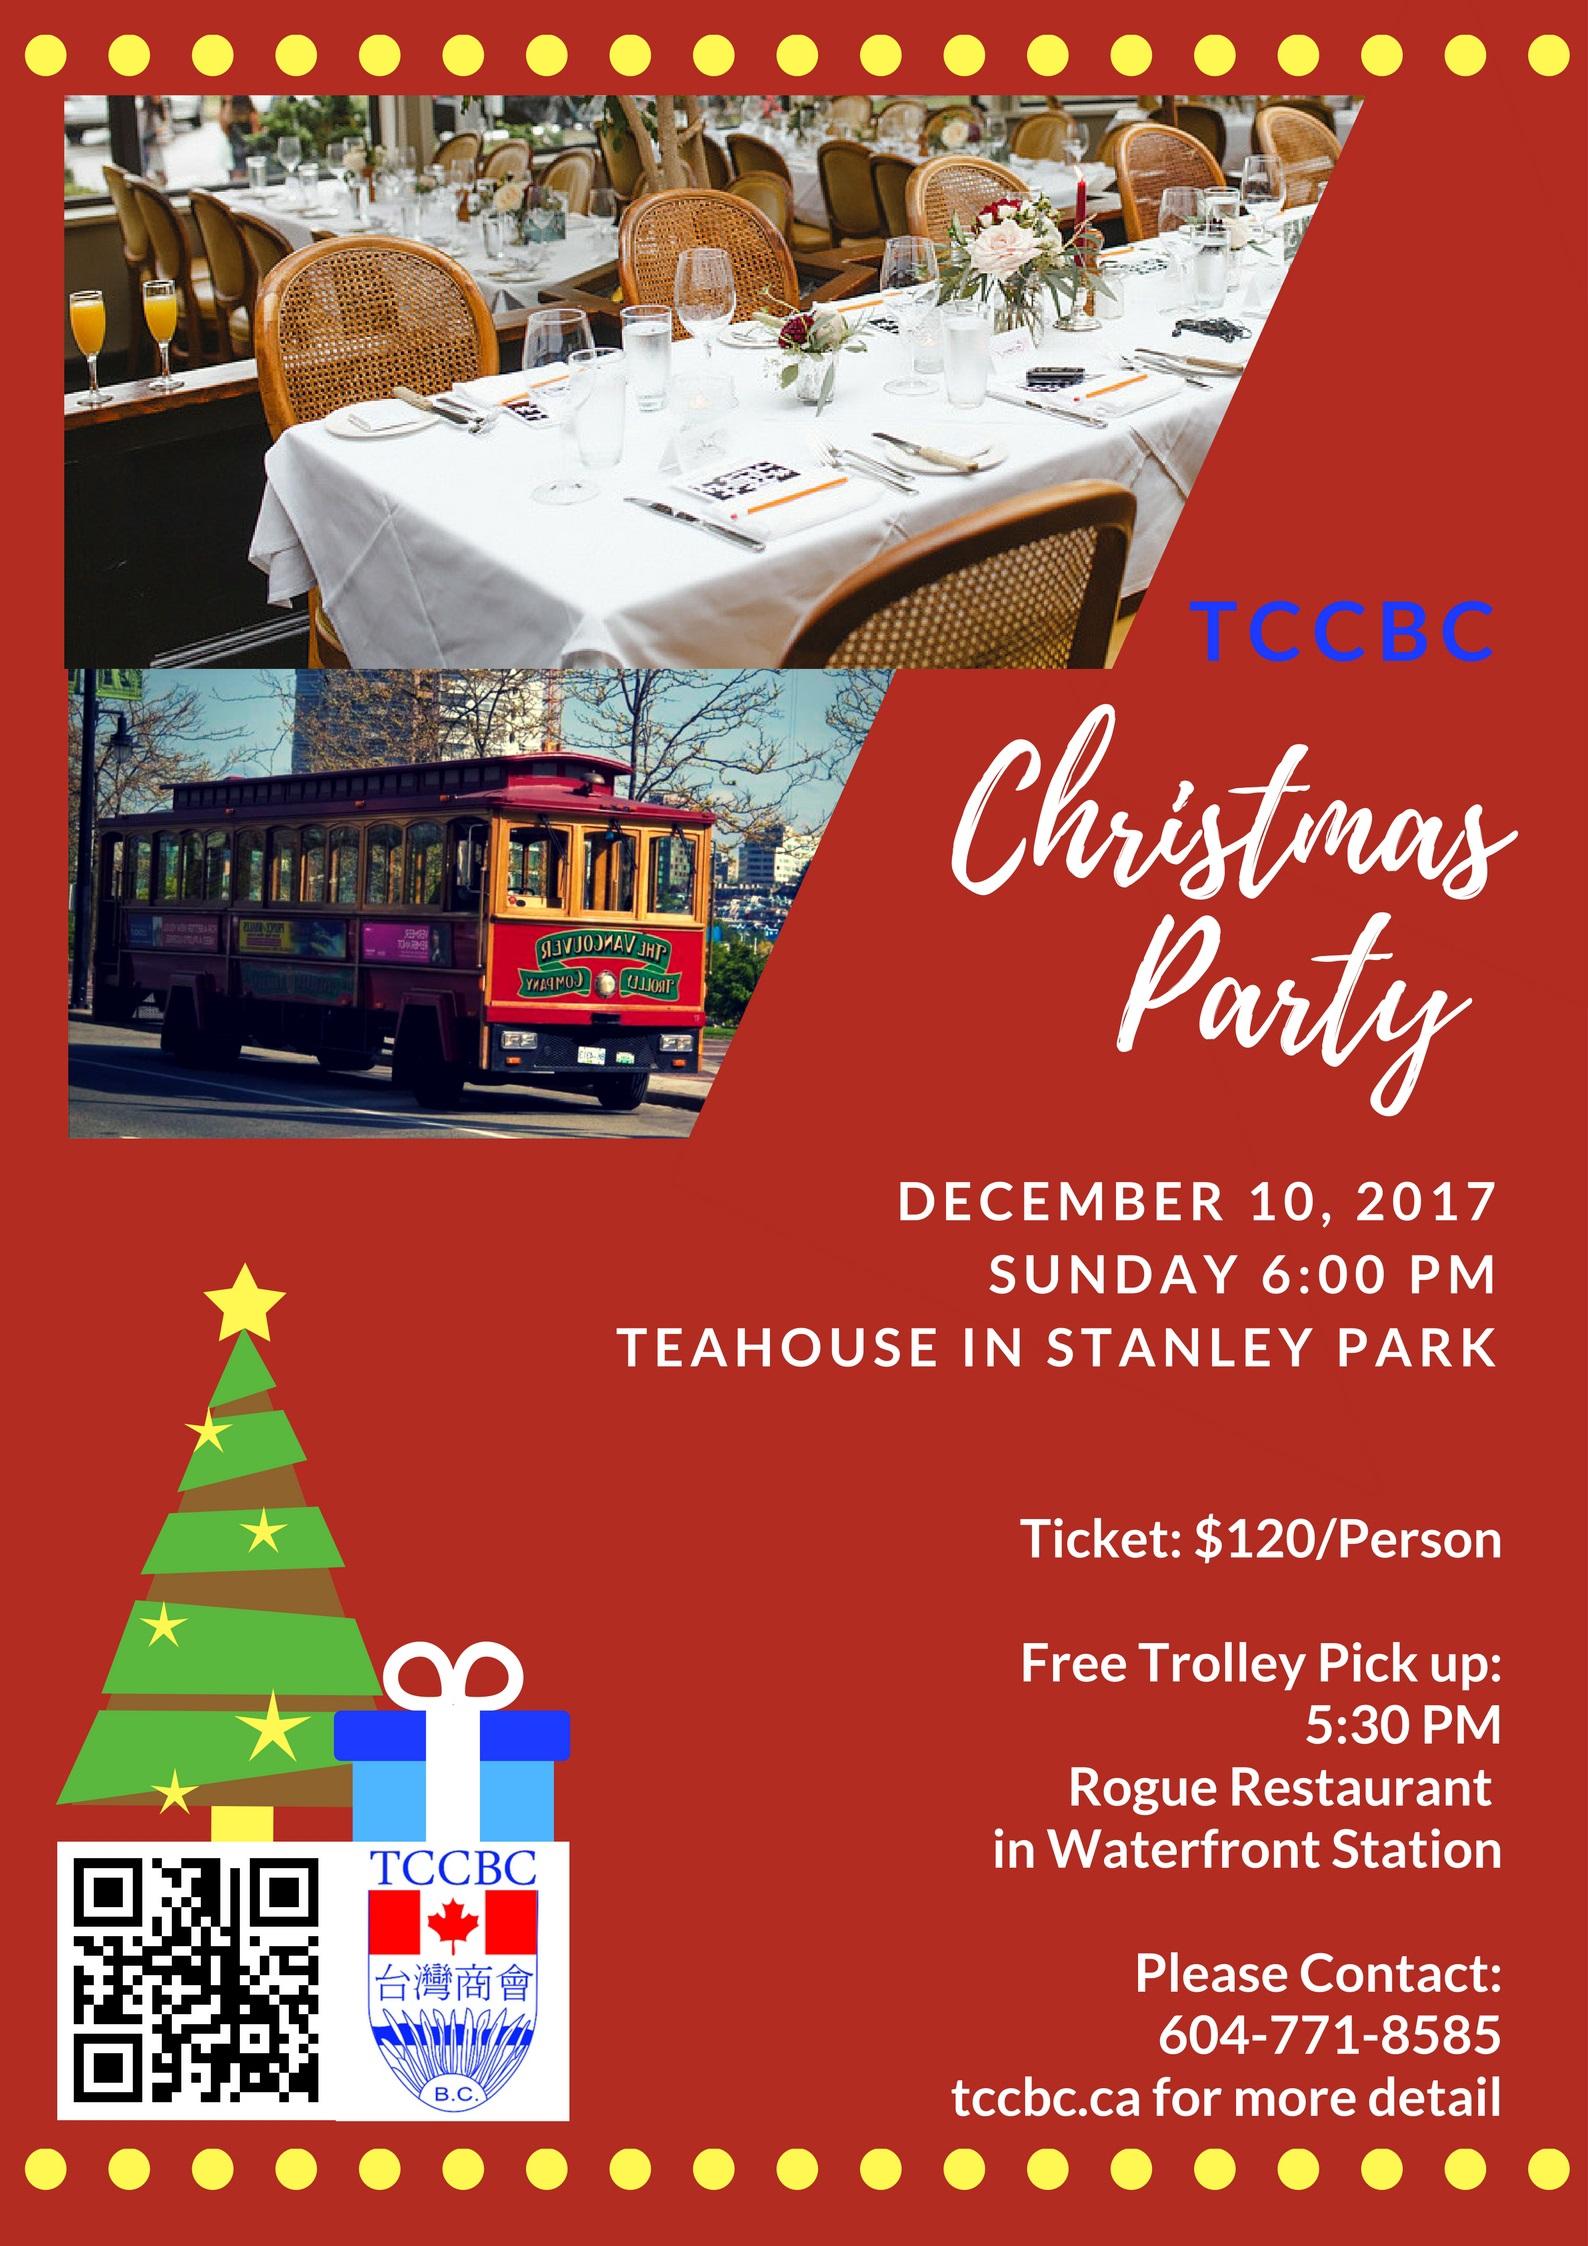 TCCBC Christmas Party